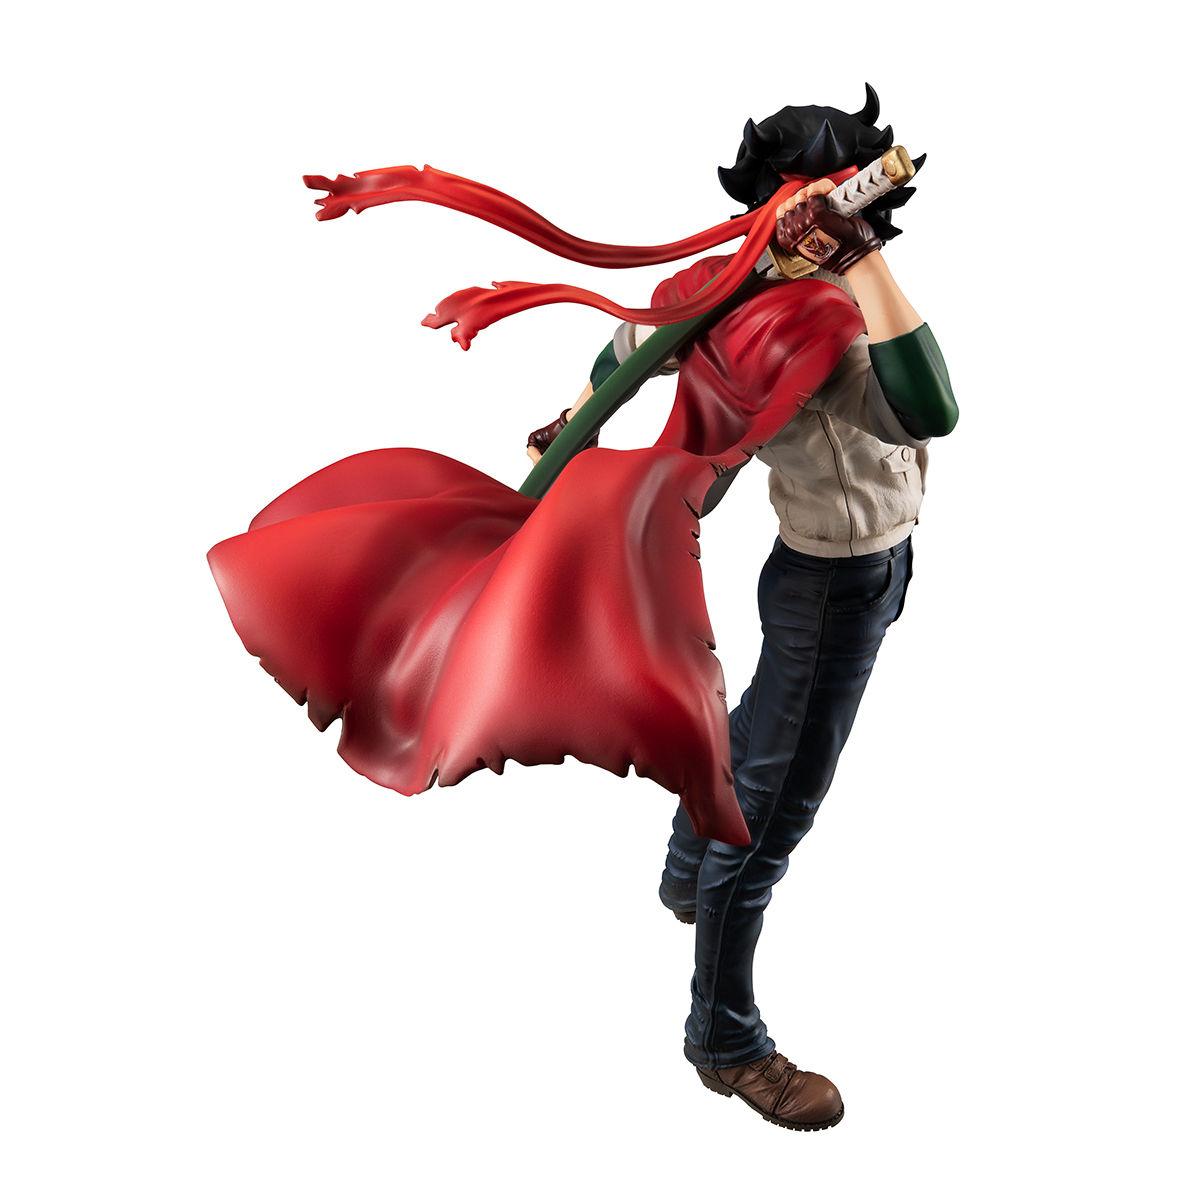 GGG『ドモン・カッシュ』機動武闘伝Gガンダム 完成品フィギュア-008